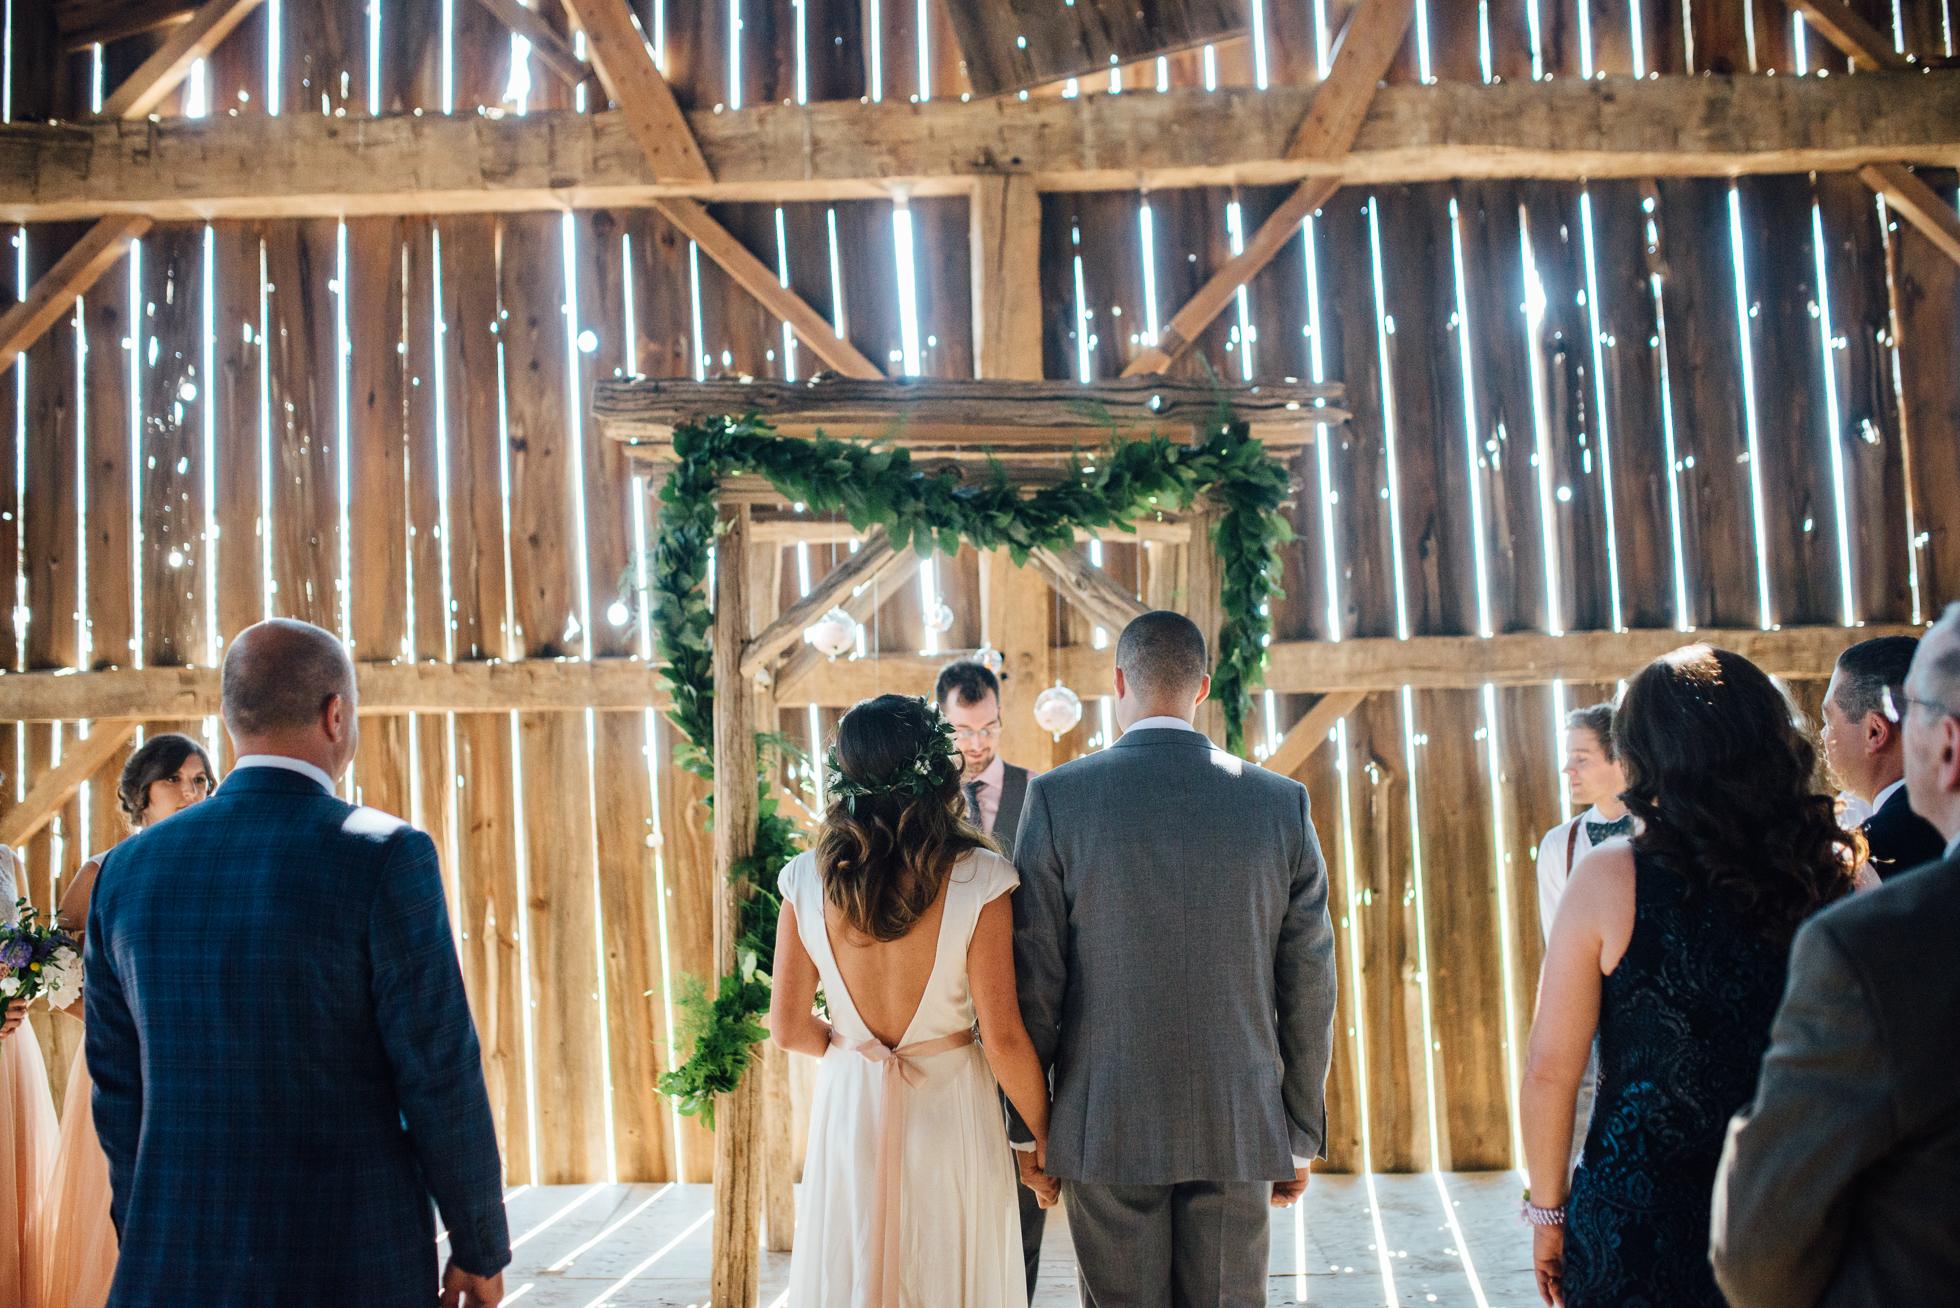 Downswell-Barn-Wedding-Photography-39.jpg